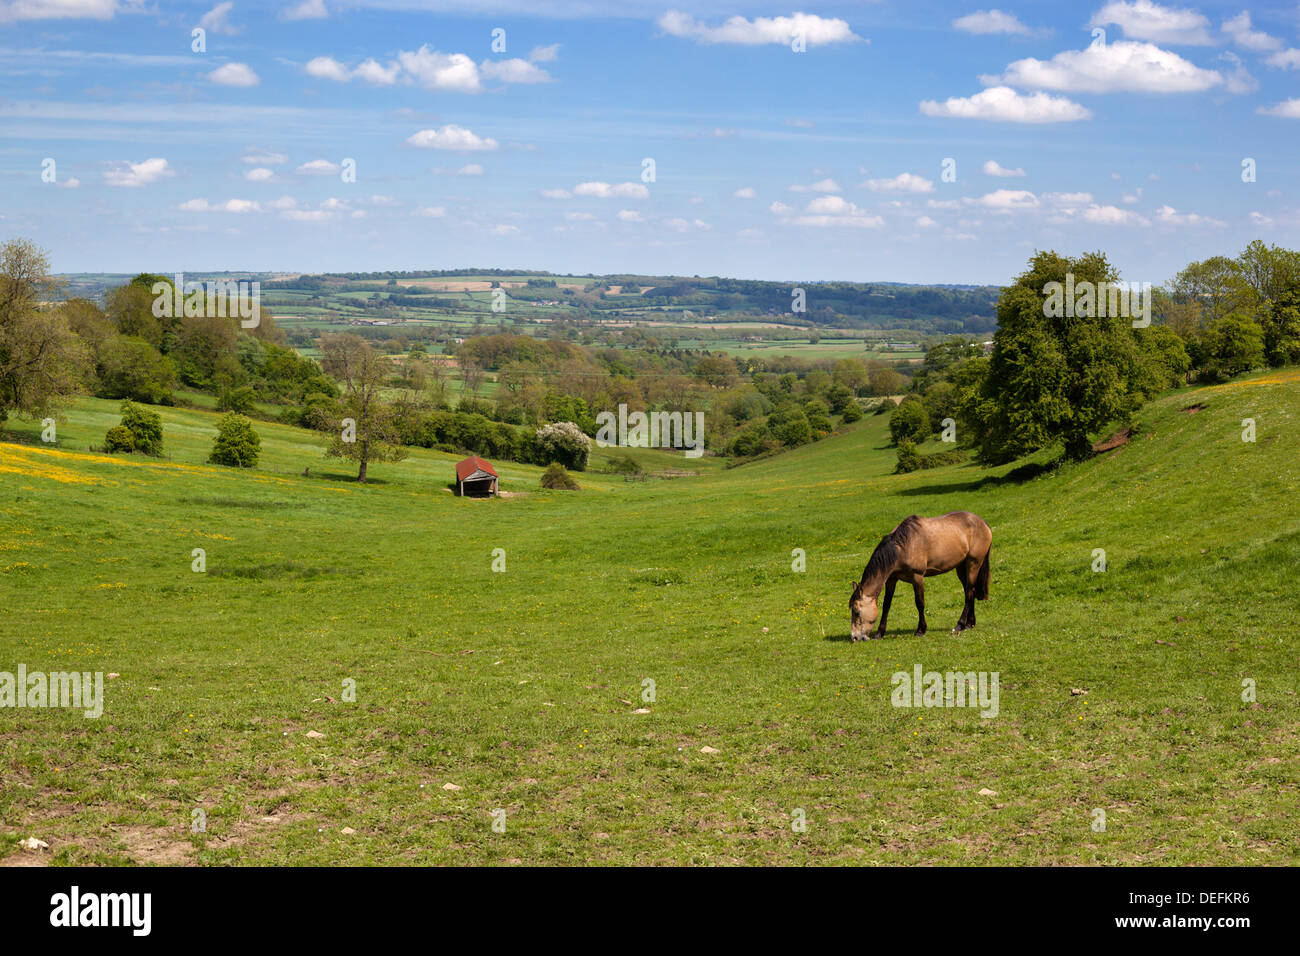 Cotswold landscape, Stow-on-the-Wold, Gloucestershire, England, United Kingdom, Europe Stock Photo